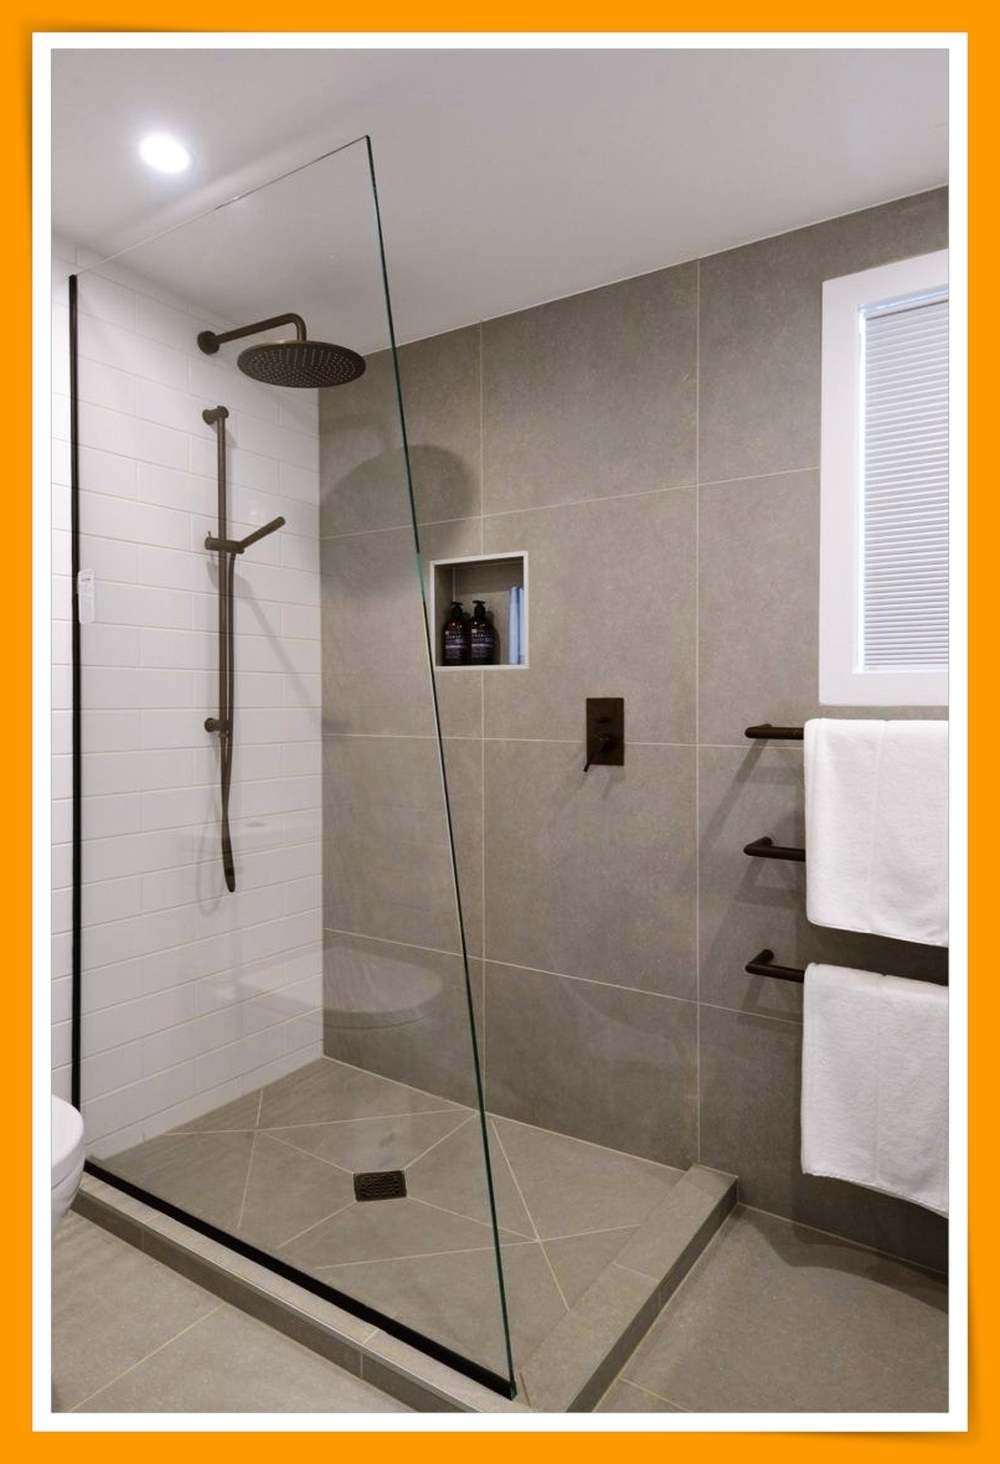 Beautiful Bathroom Decor Suggestions In 2020 Bathroom Design Small Bathroom Shower Walls Minimalist Small Bathrooms